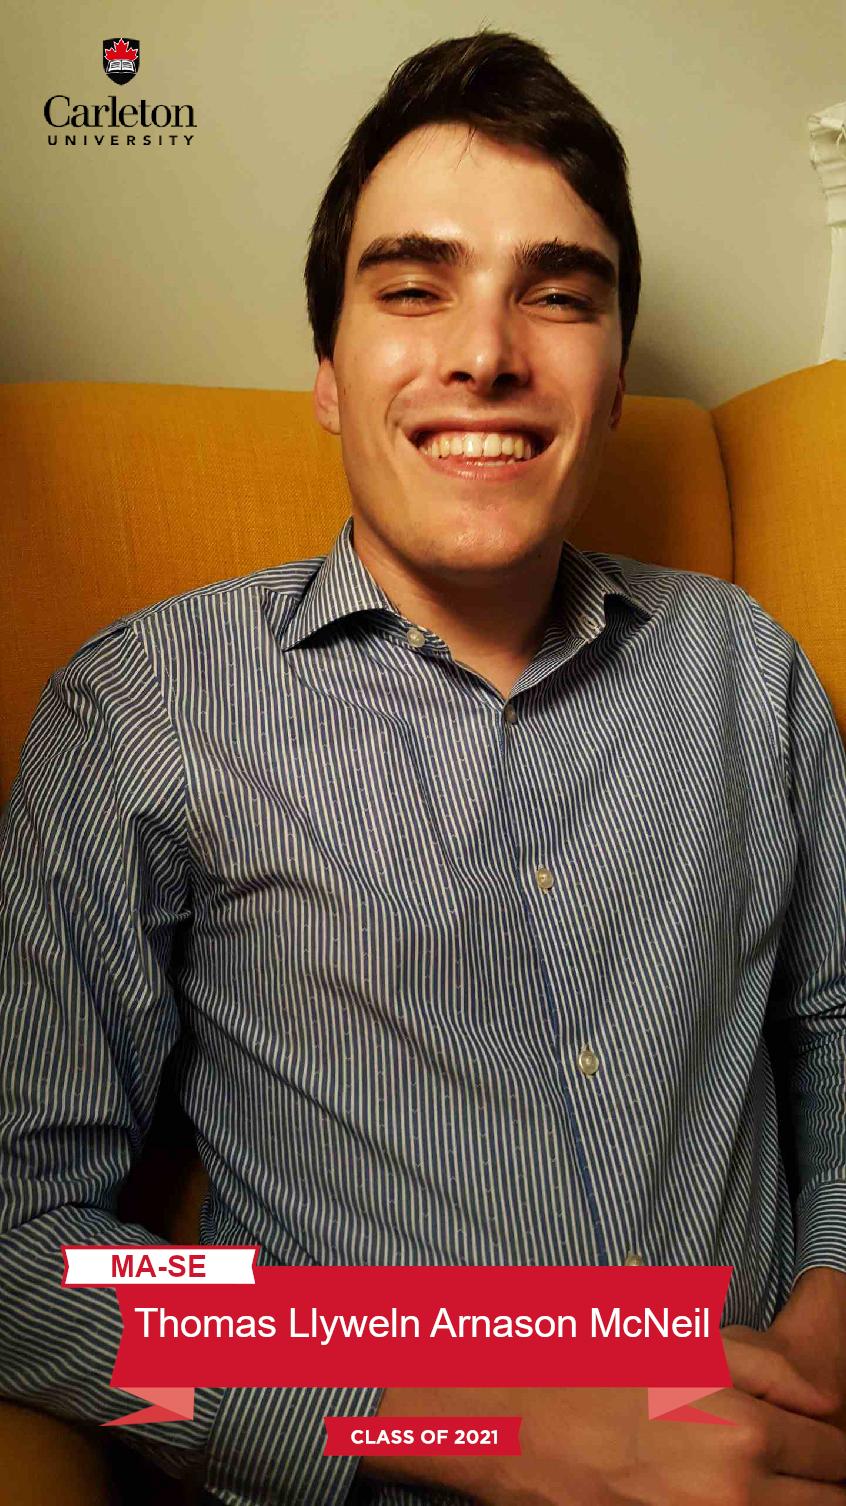 Mohammad Salah Uddin. MA-SE graduate, class of 2021